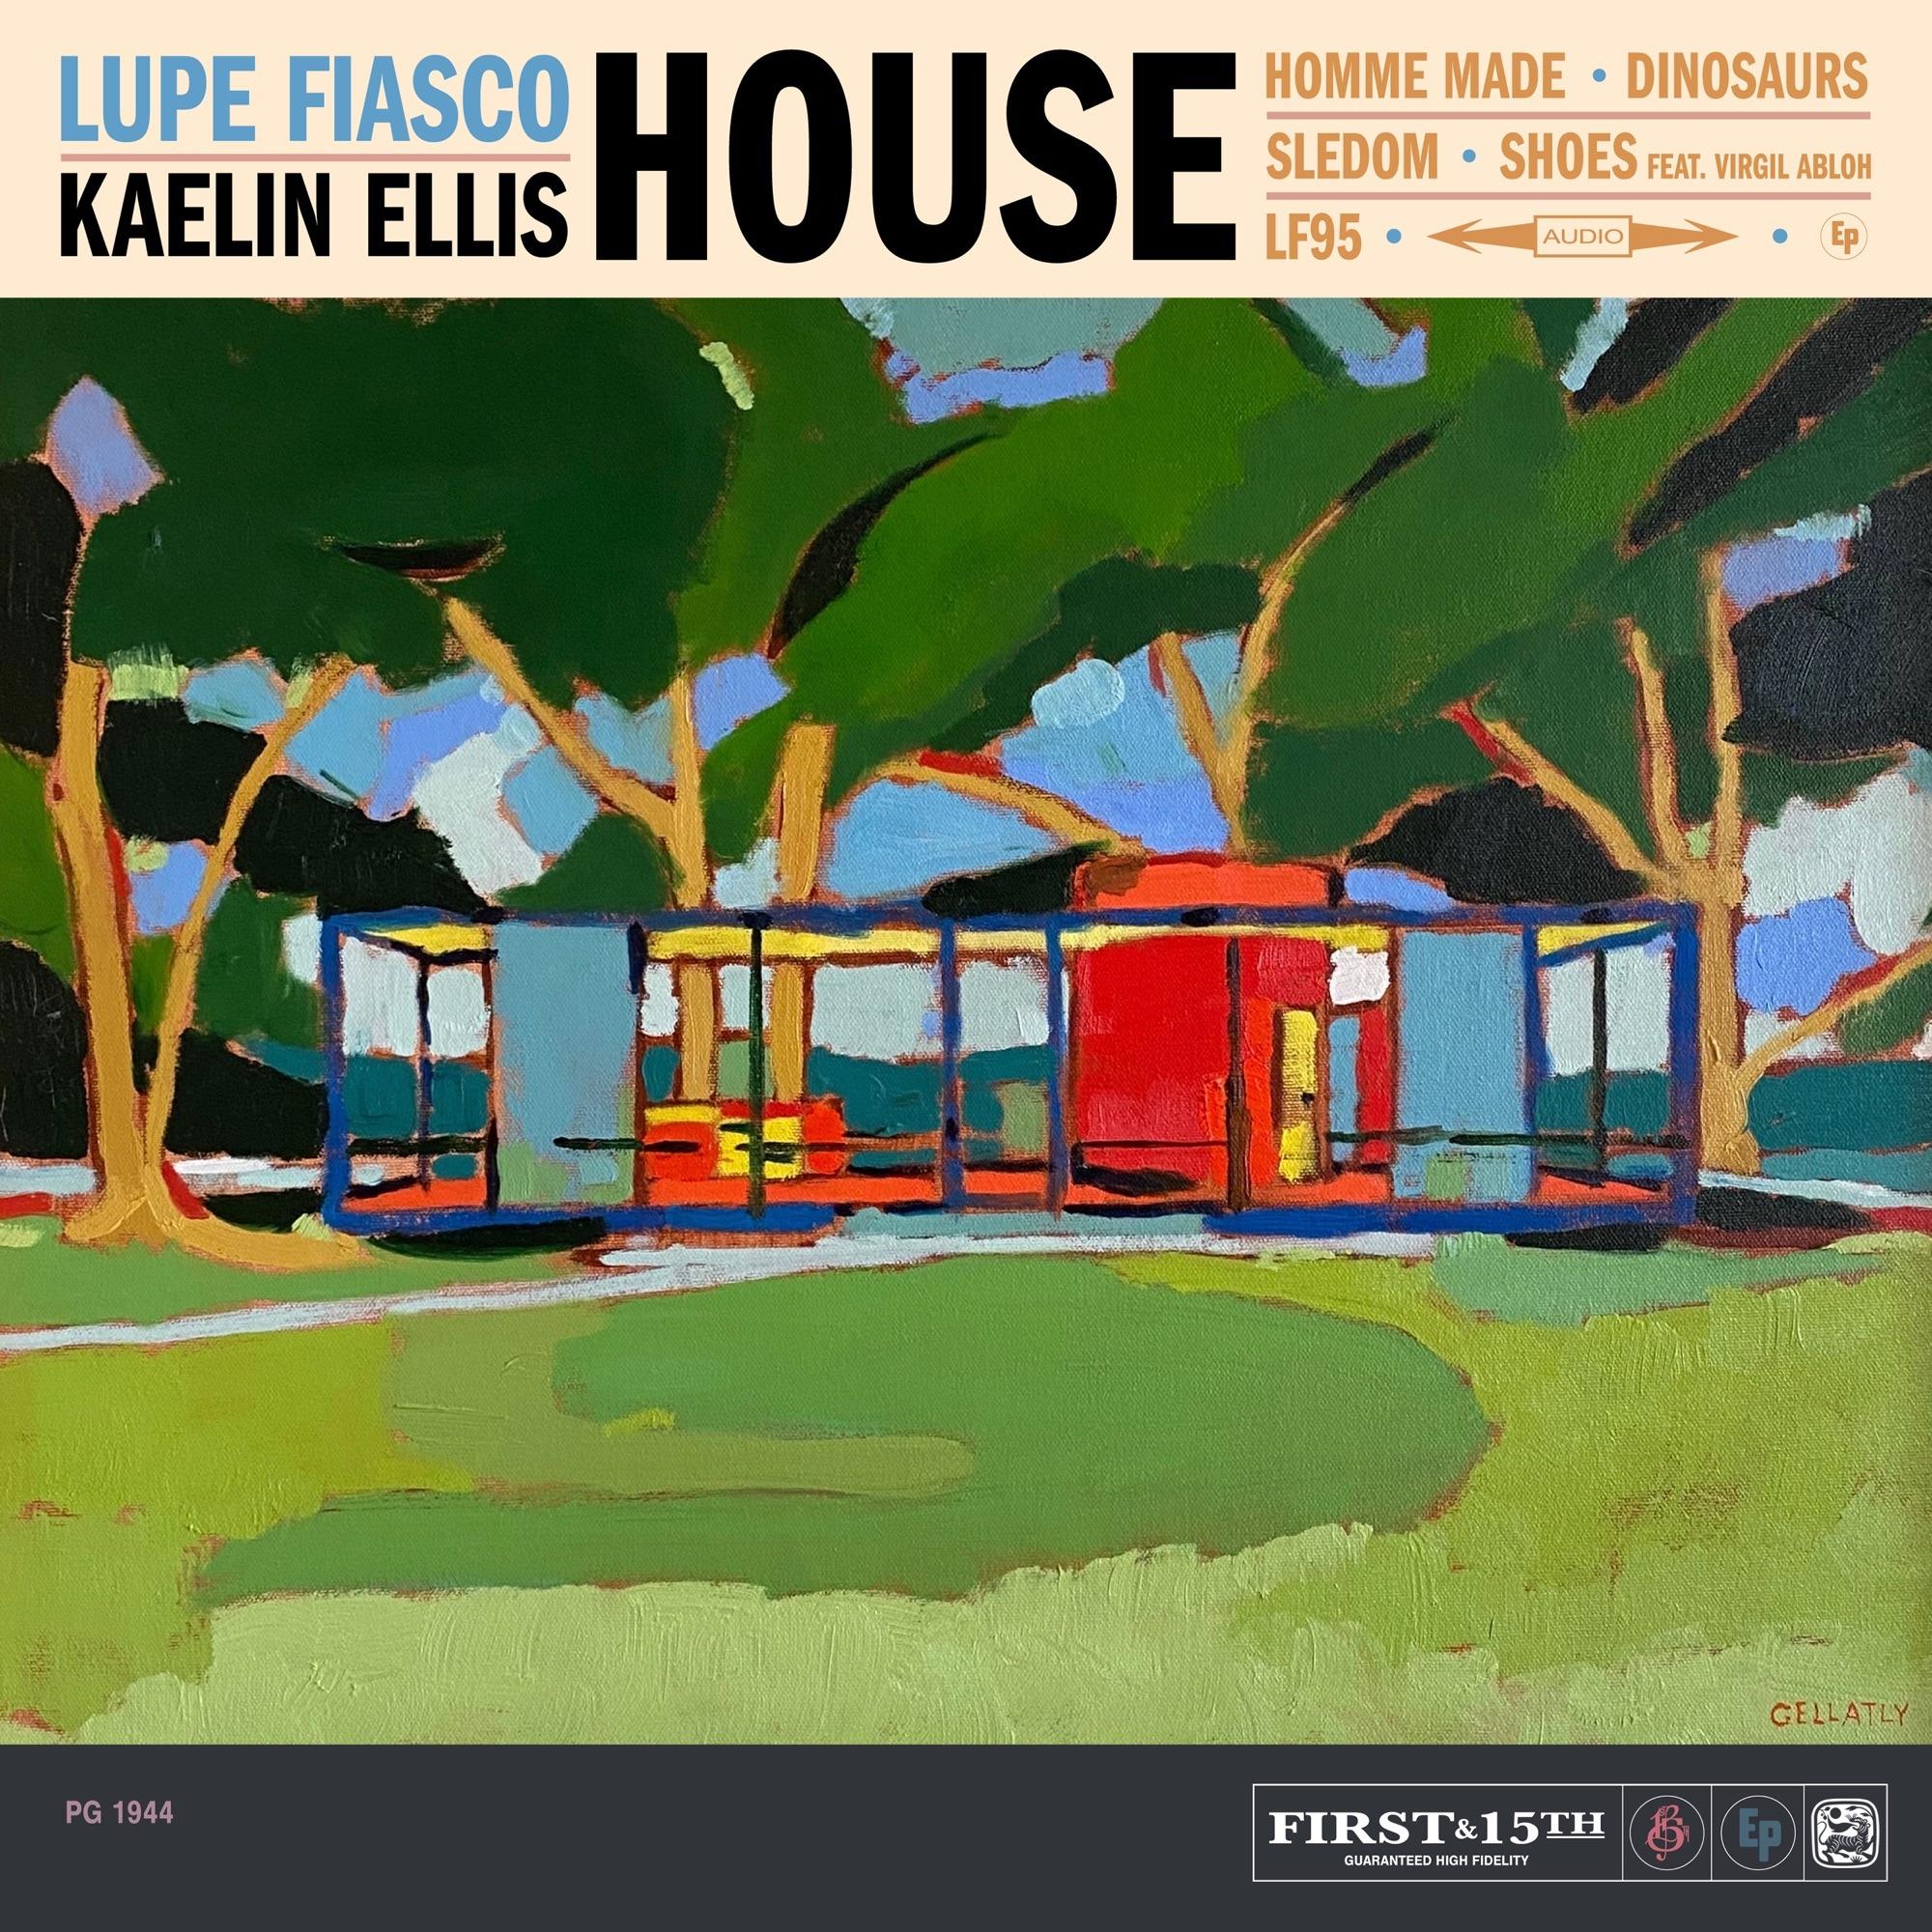 Lupe Fiasco & Kaelin Ellis - HOUSE (feat. Virgil Abloh)